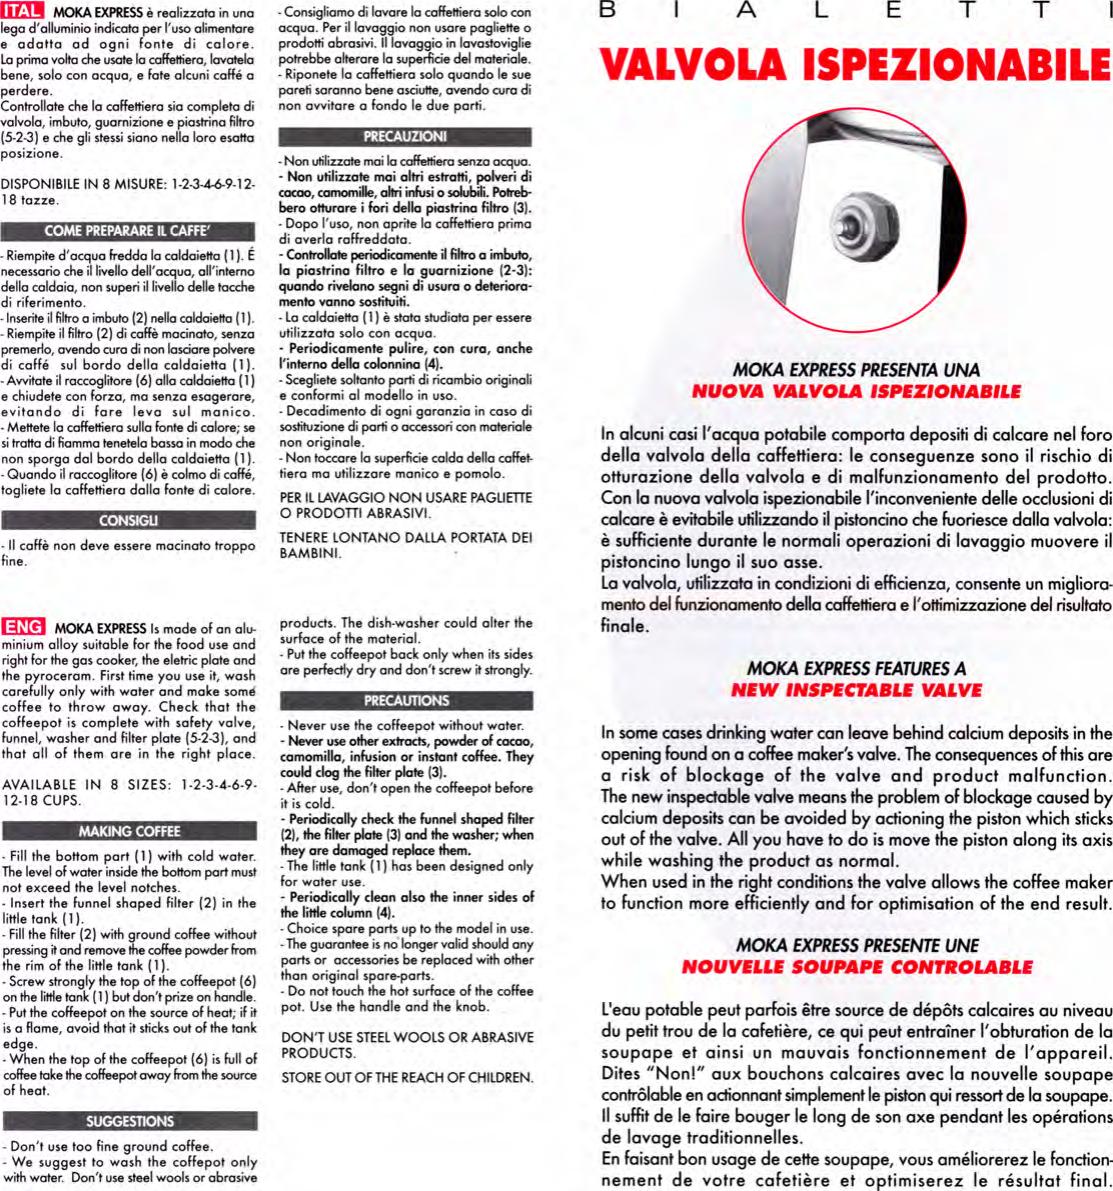 Page 2 of 2 - Bialetti Bialetti-Coffee-Maker-Mokaexpress-Users-Manual- Moka Express  Bialetti-coffee-maker-mokaexpress-users-manual